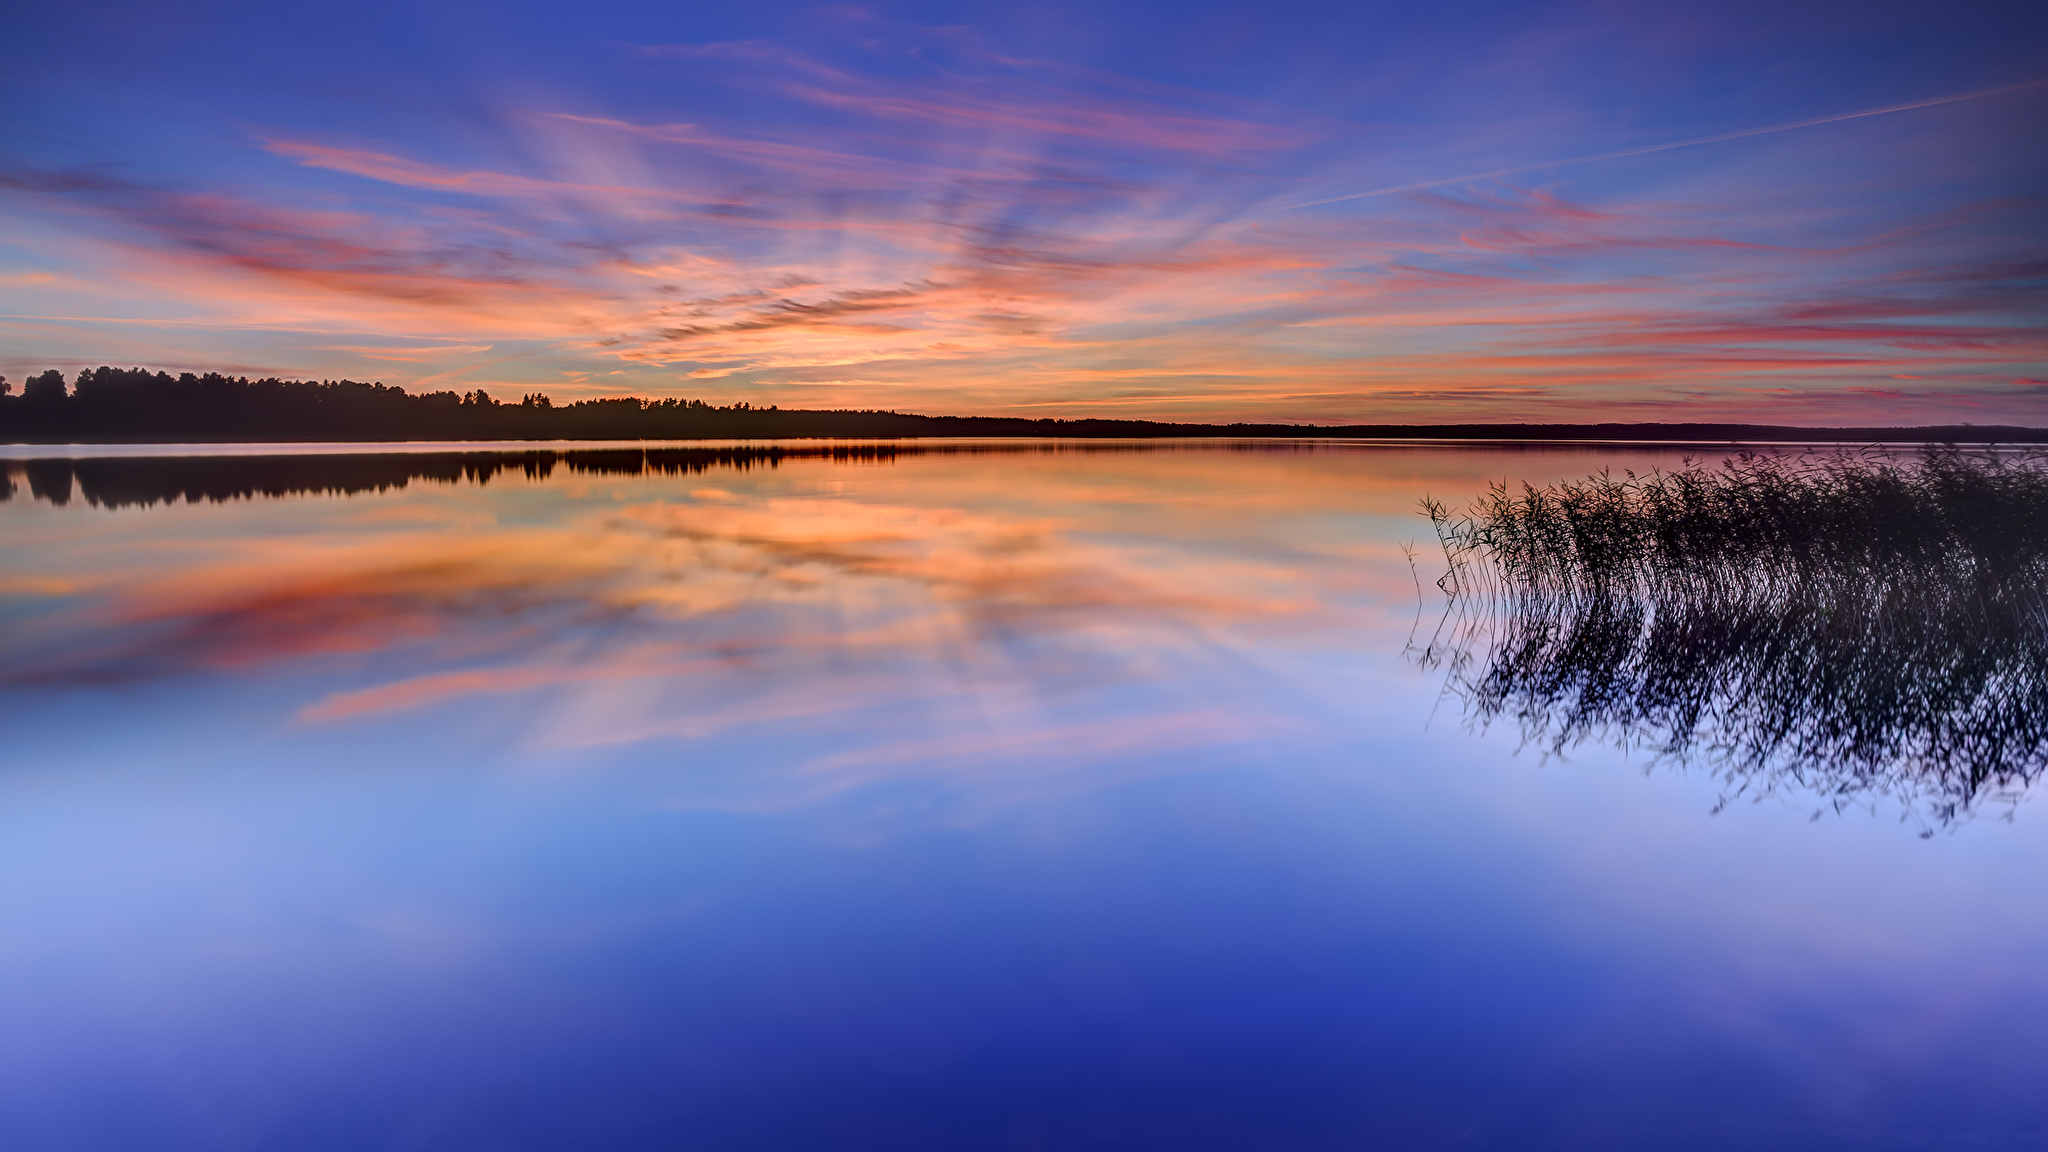 природа деревья небо озеро трава вода без смс